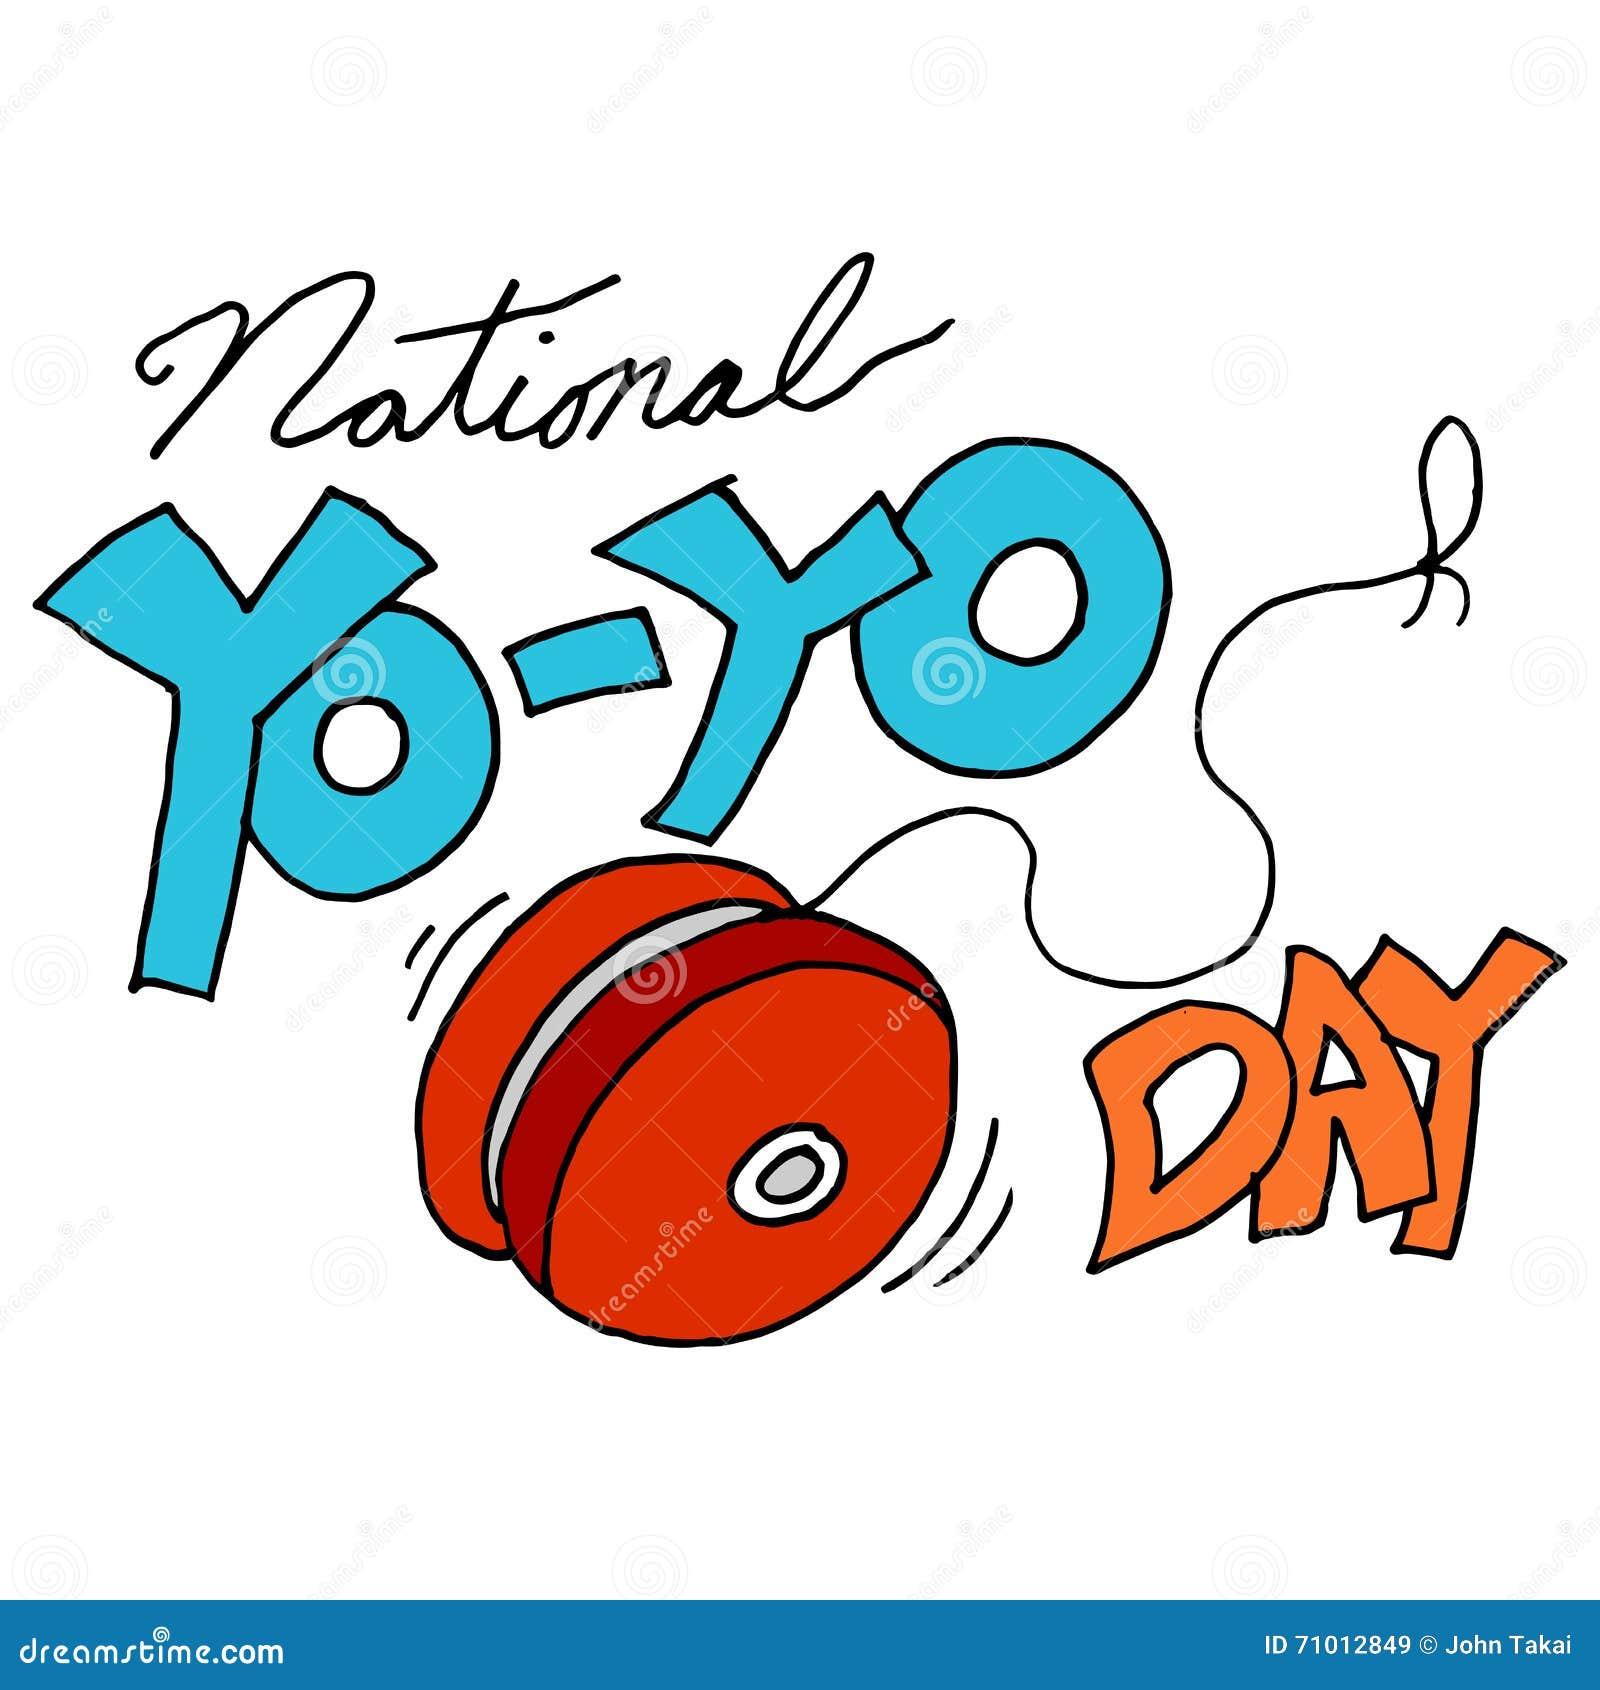 Yoyo Stock Illustrations – 204 Yoyo Stock Illustrations, Vectors ... for Clipart Yoyo  45ifm